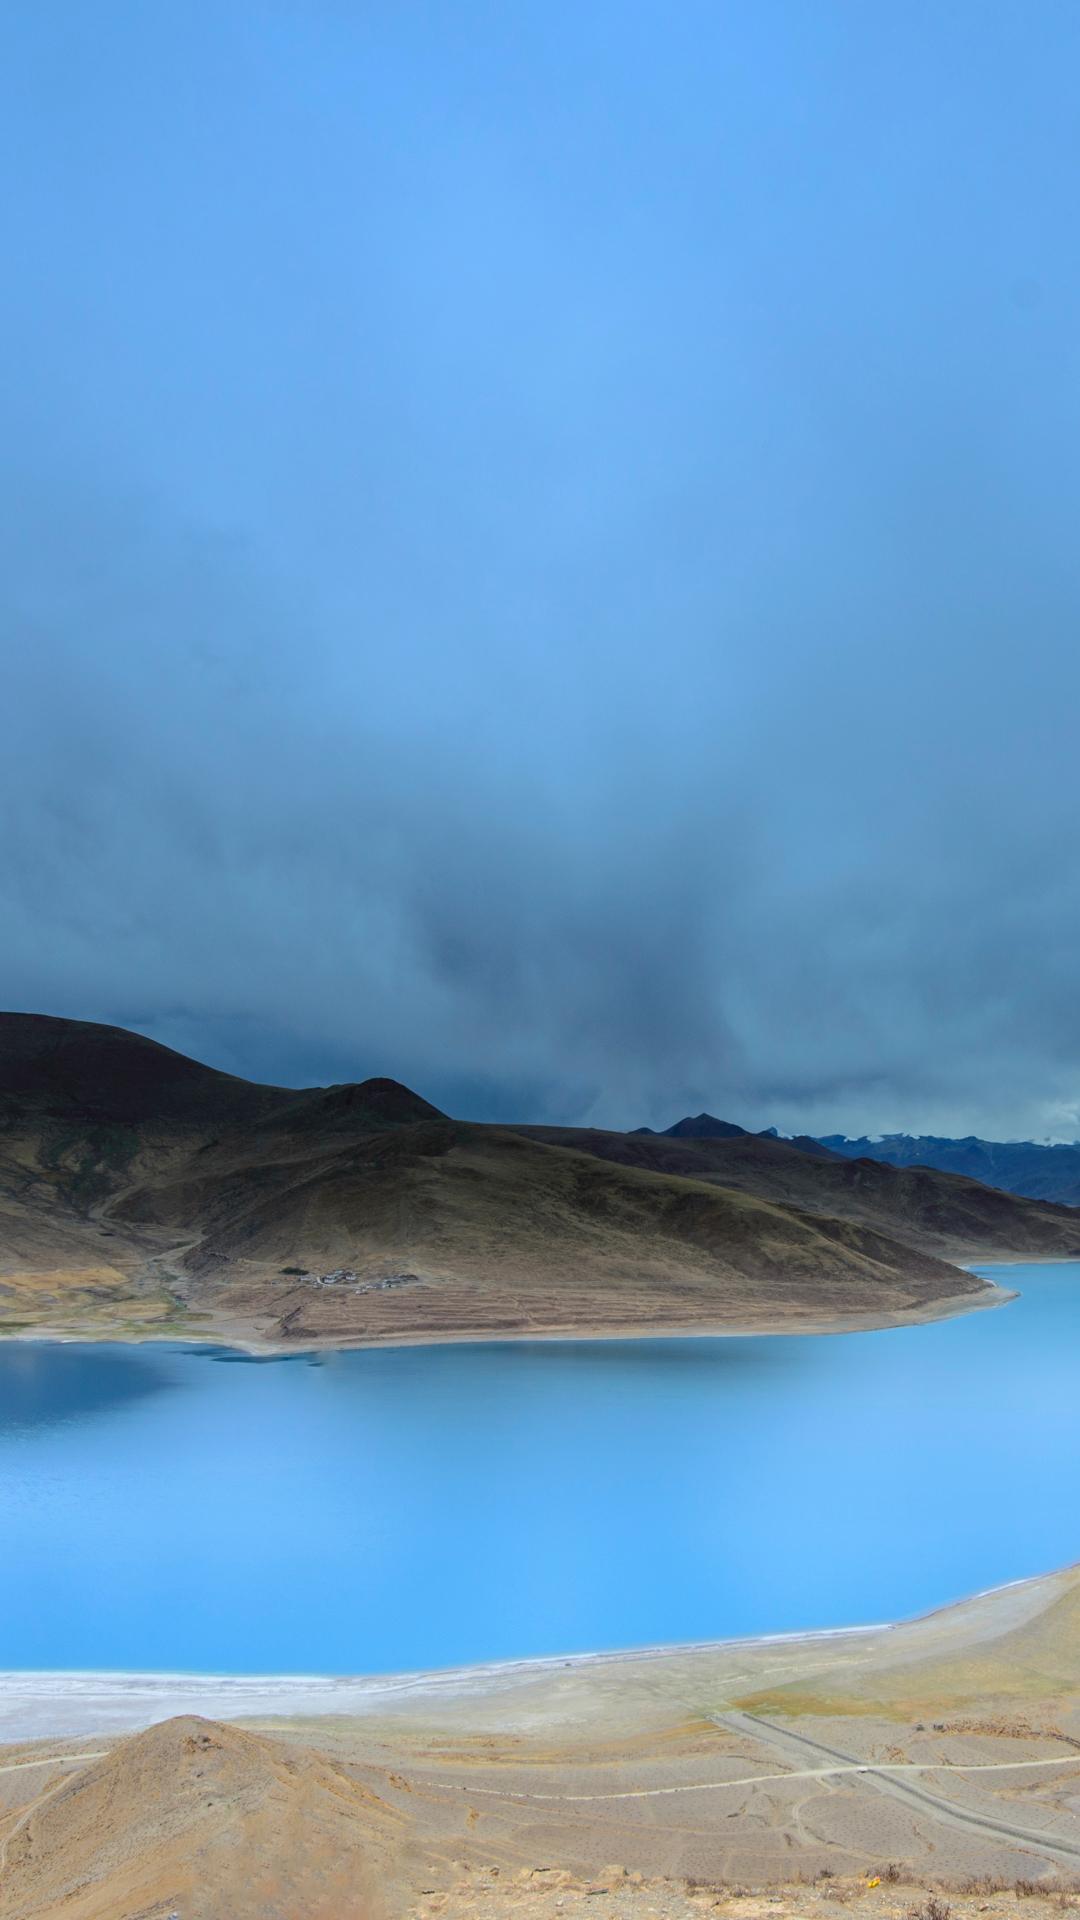 Cloud, Sky, Water iPhone Wallpaper